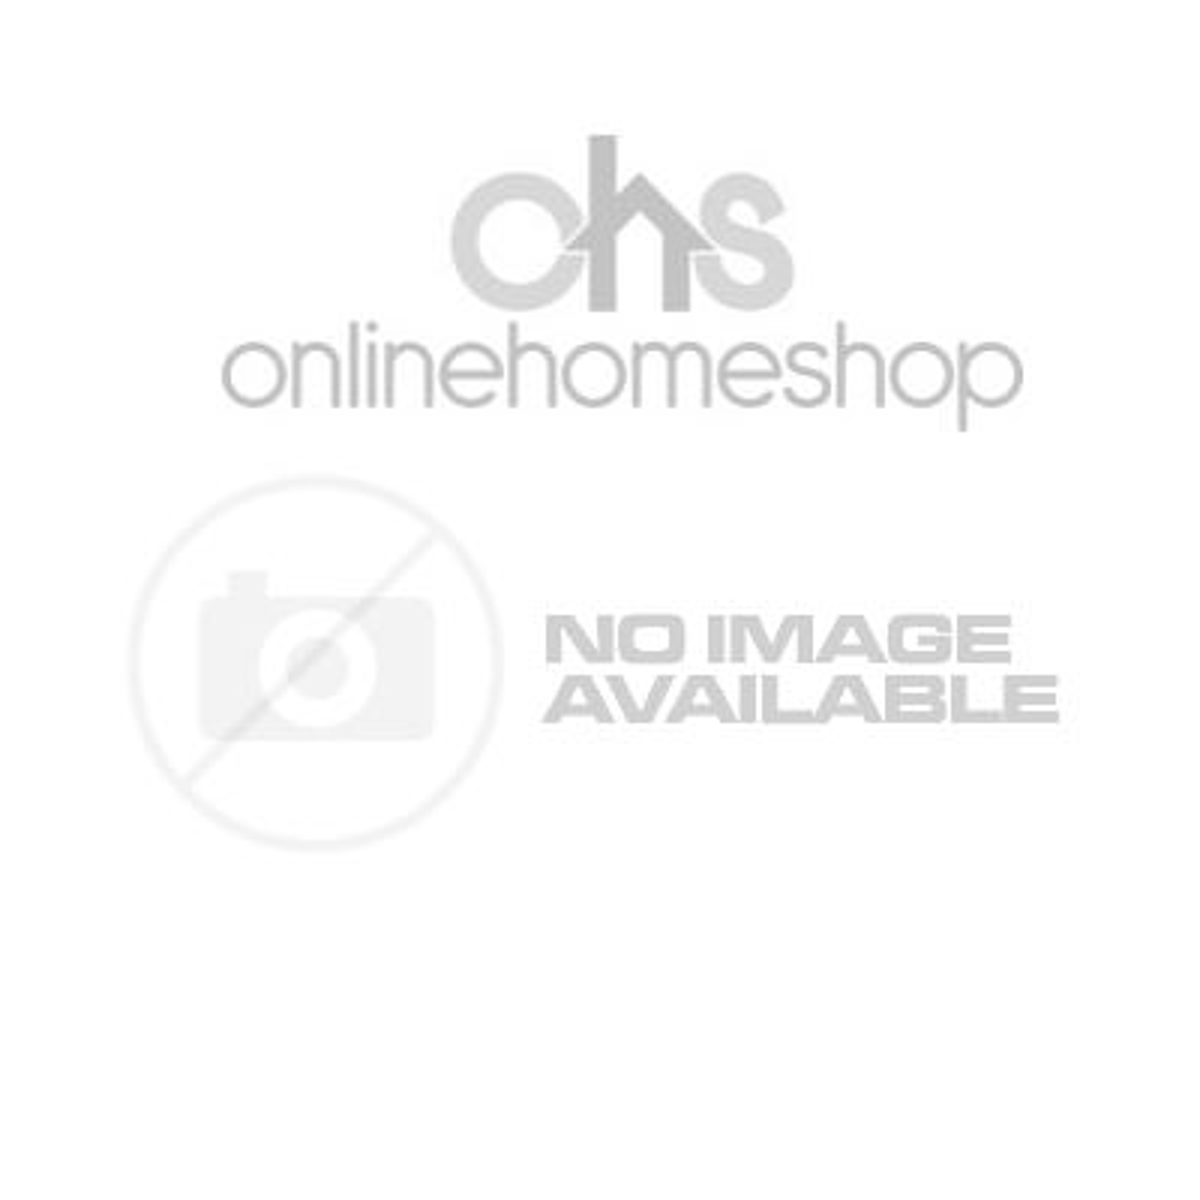 Highams 10 Piece Towel Bale Gift Sets 550 gsm - 100% Cotton - Aqua Blue